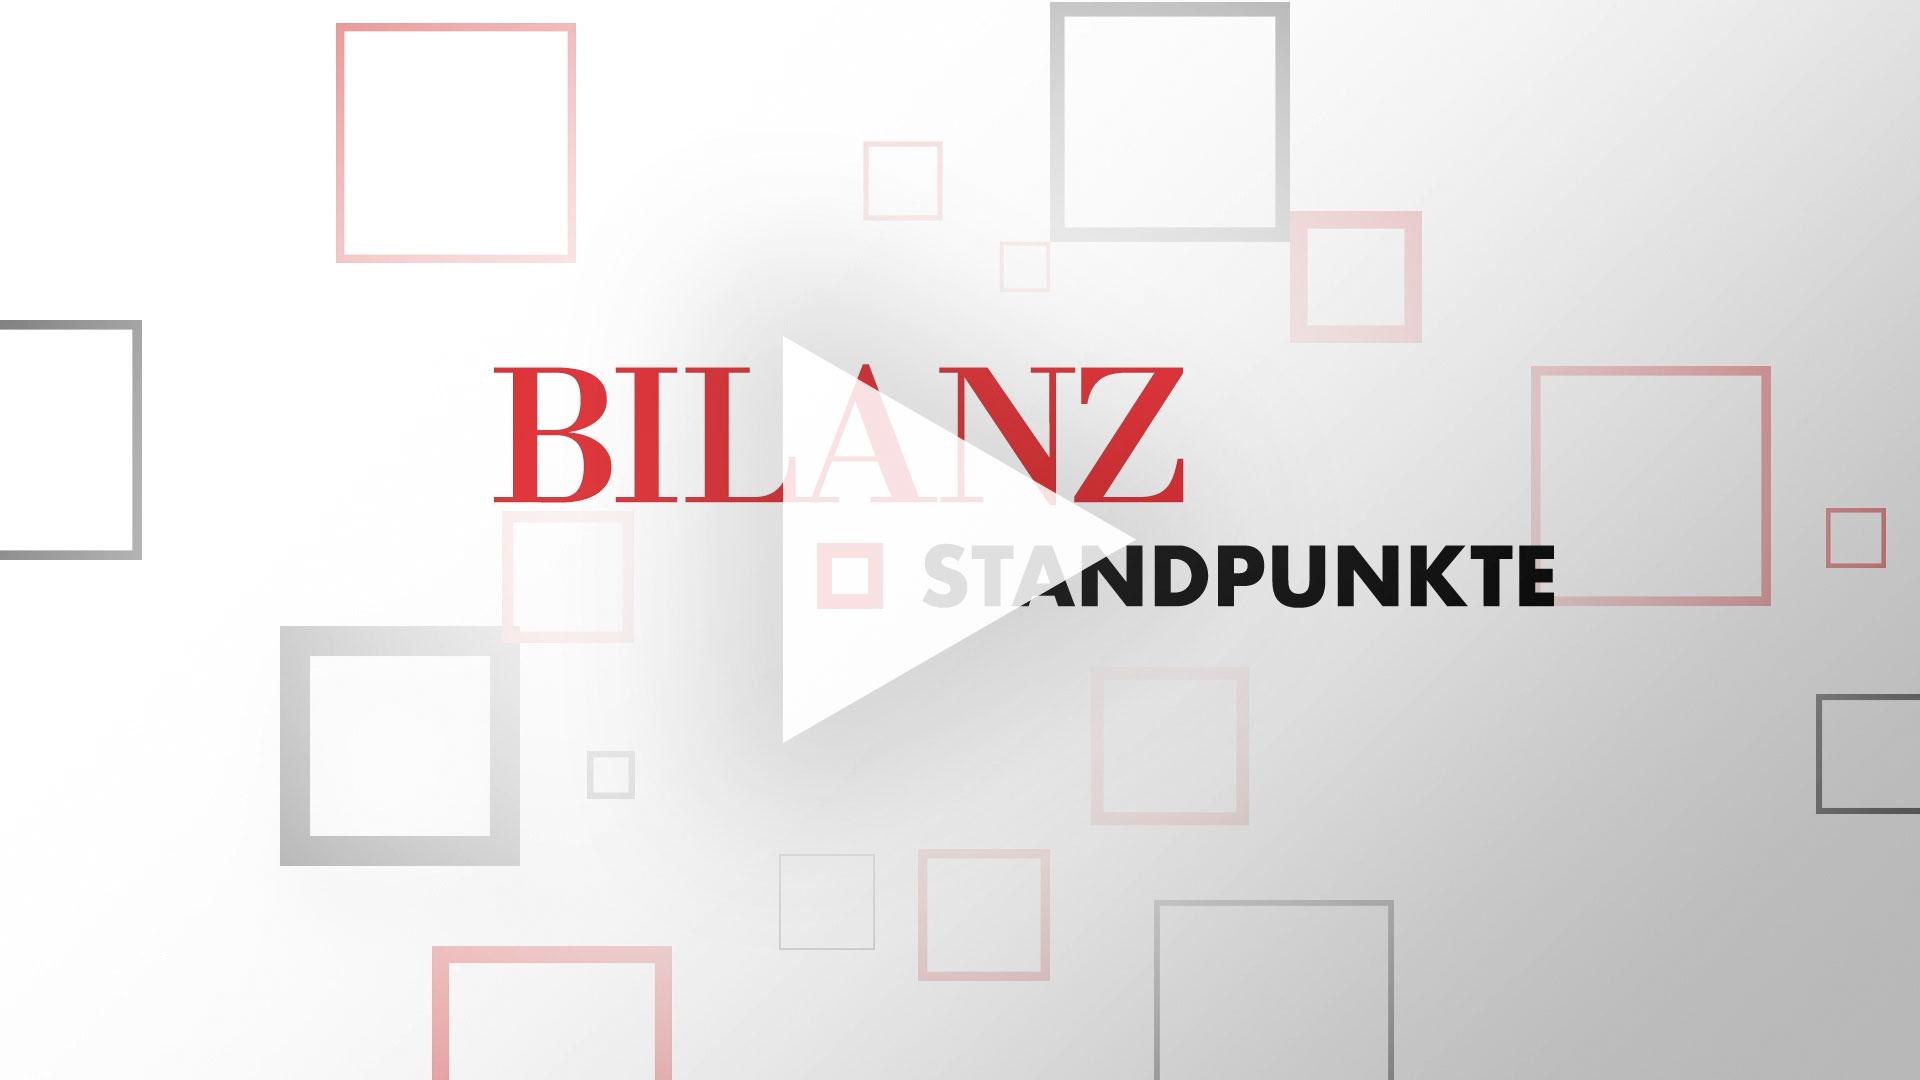 Pfeil-Thumbnail_Bilanz-Standpunkte